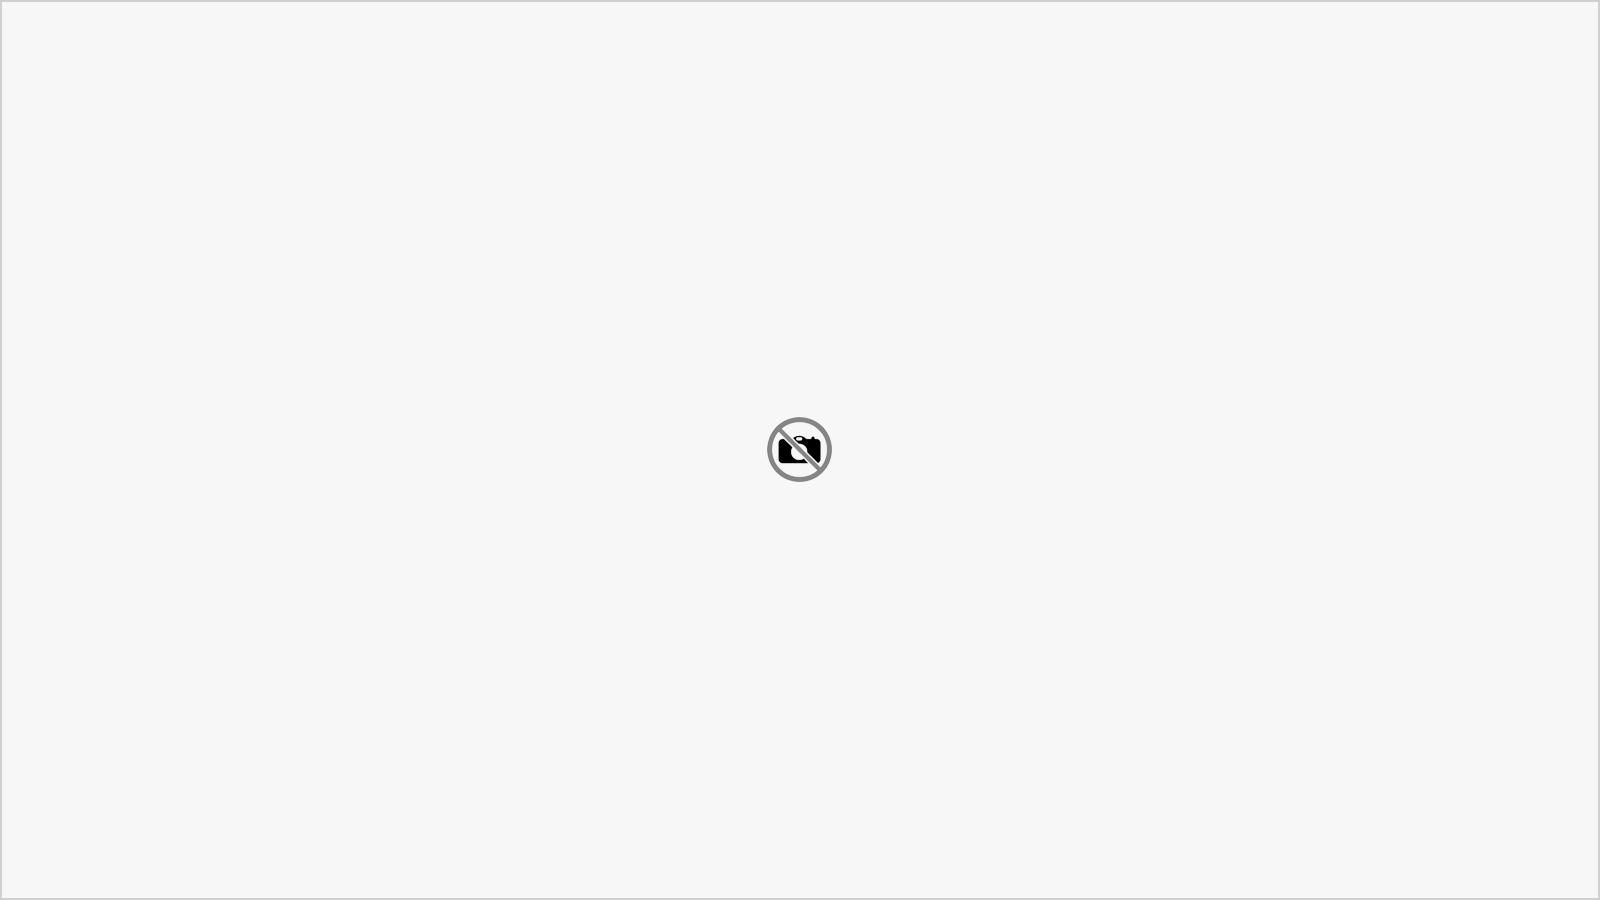 courant.fr/upload/produit/image/1600x900/flexichoc.jpg